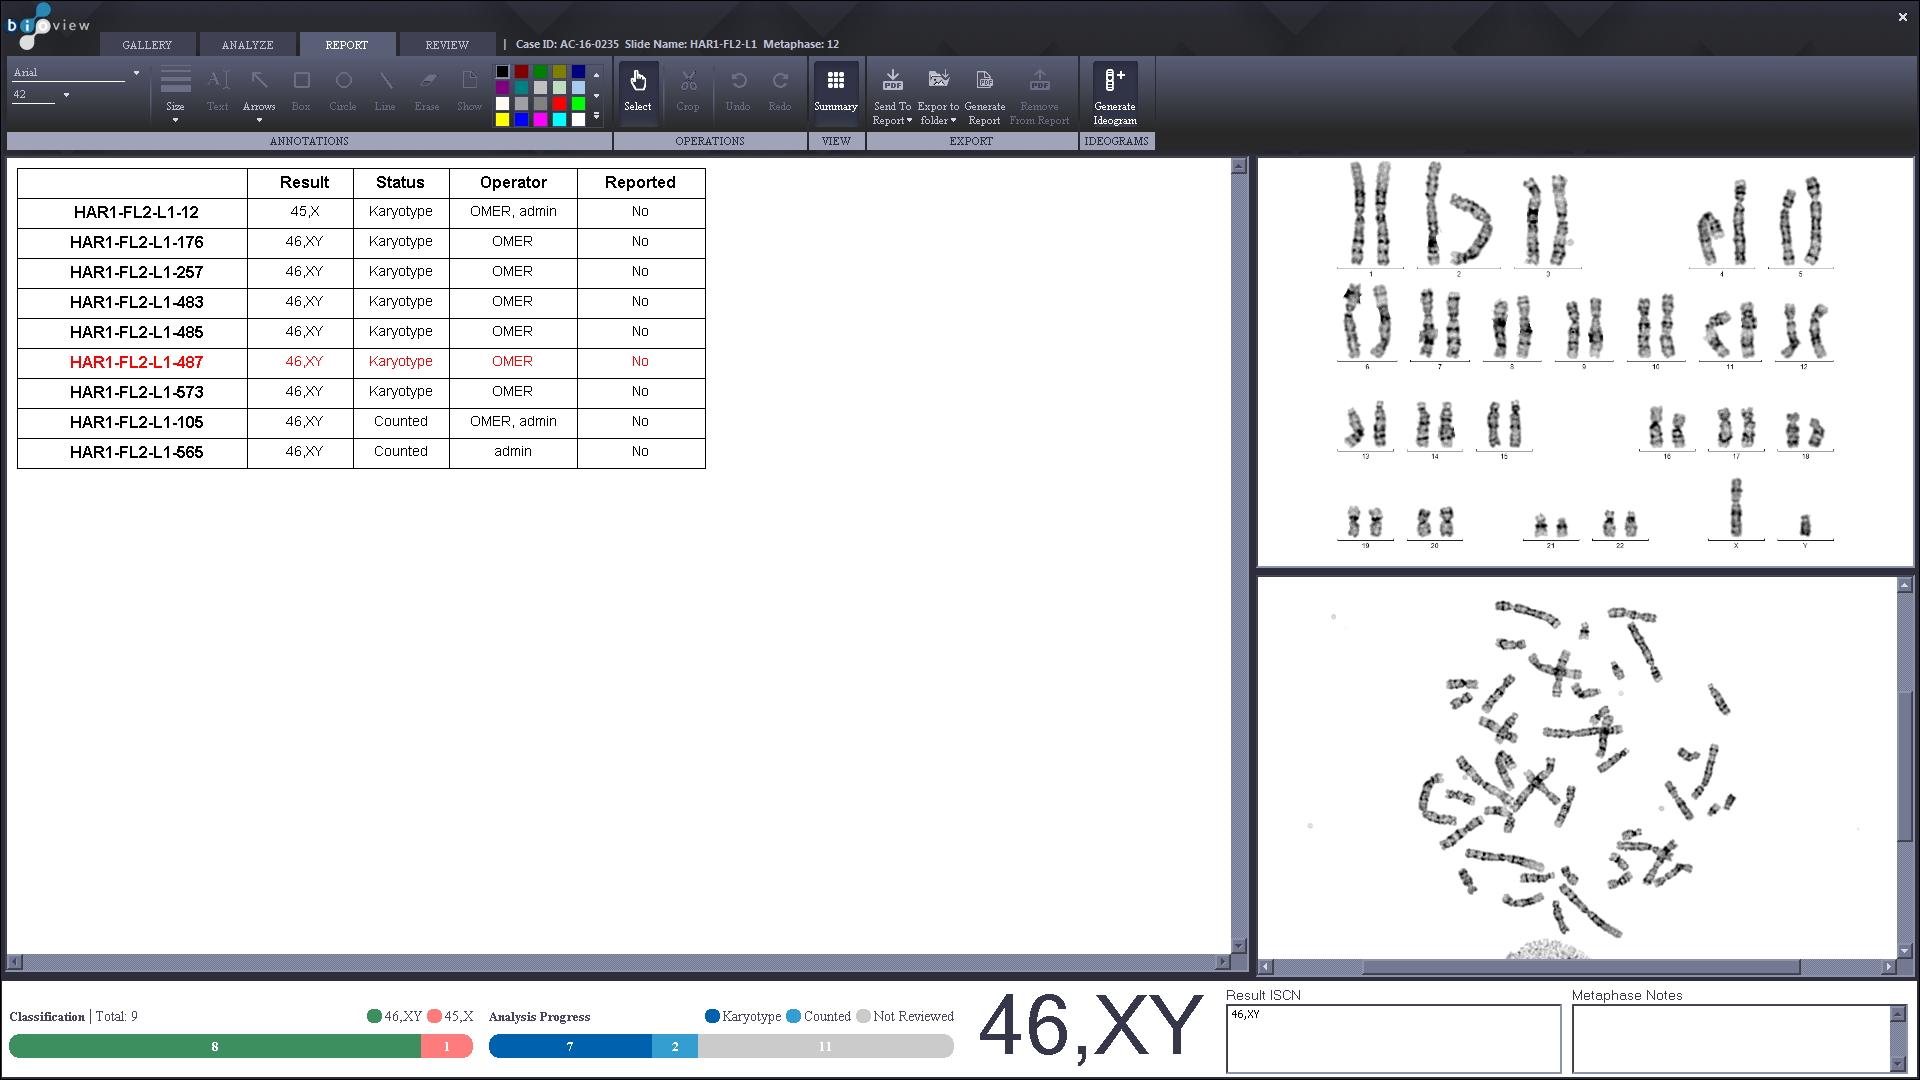 karyotype case summary page